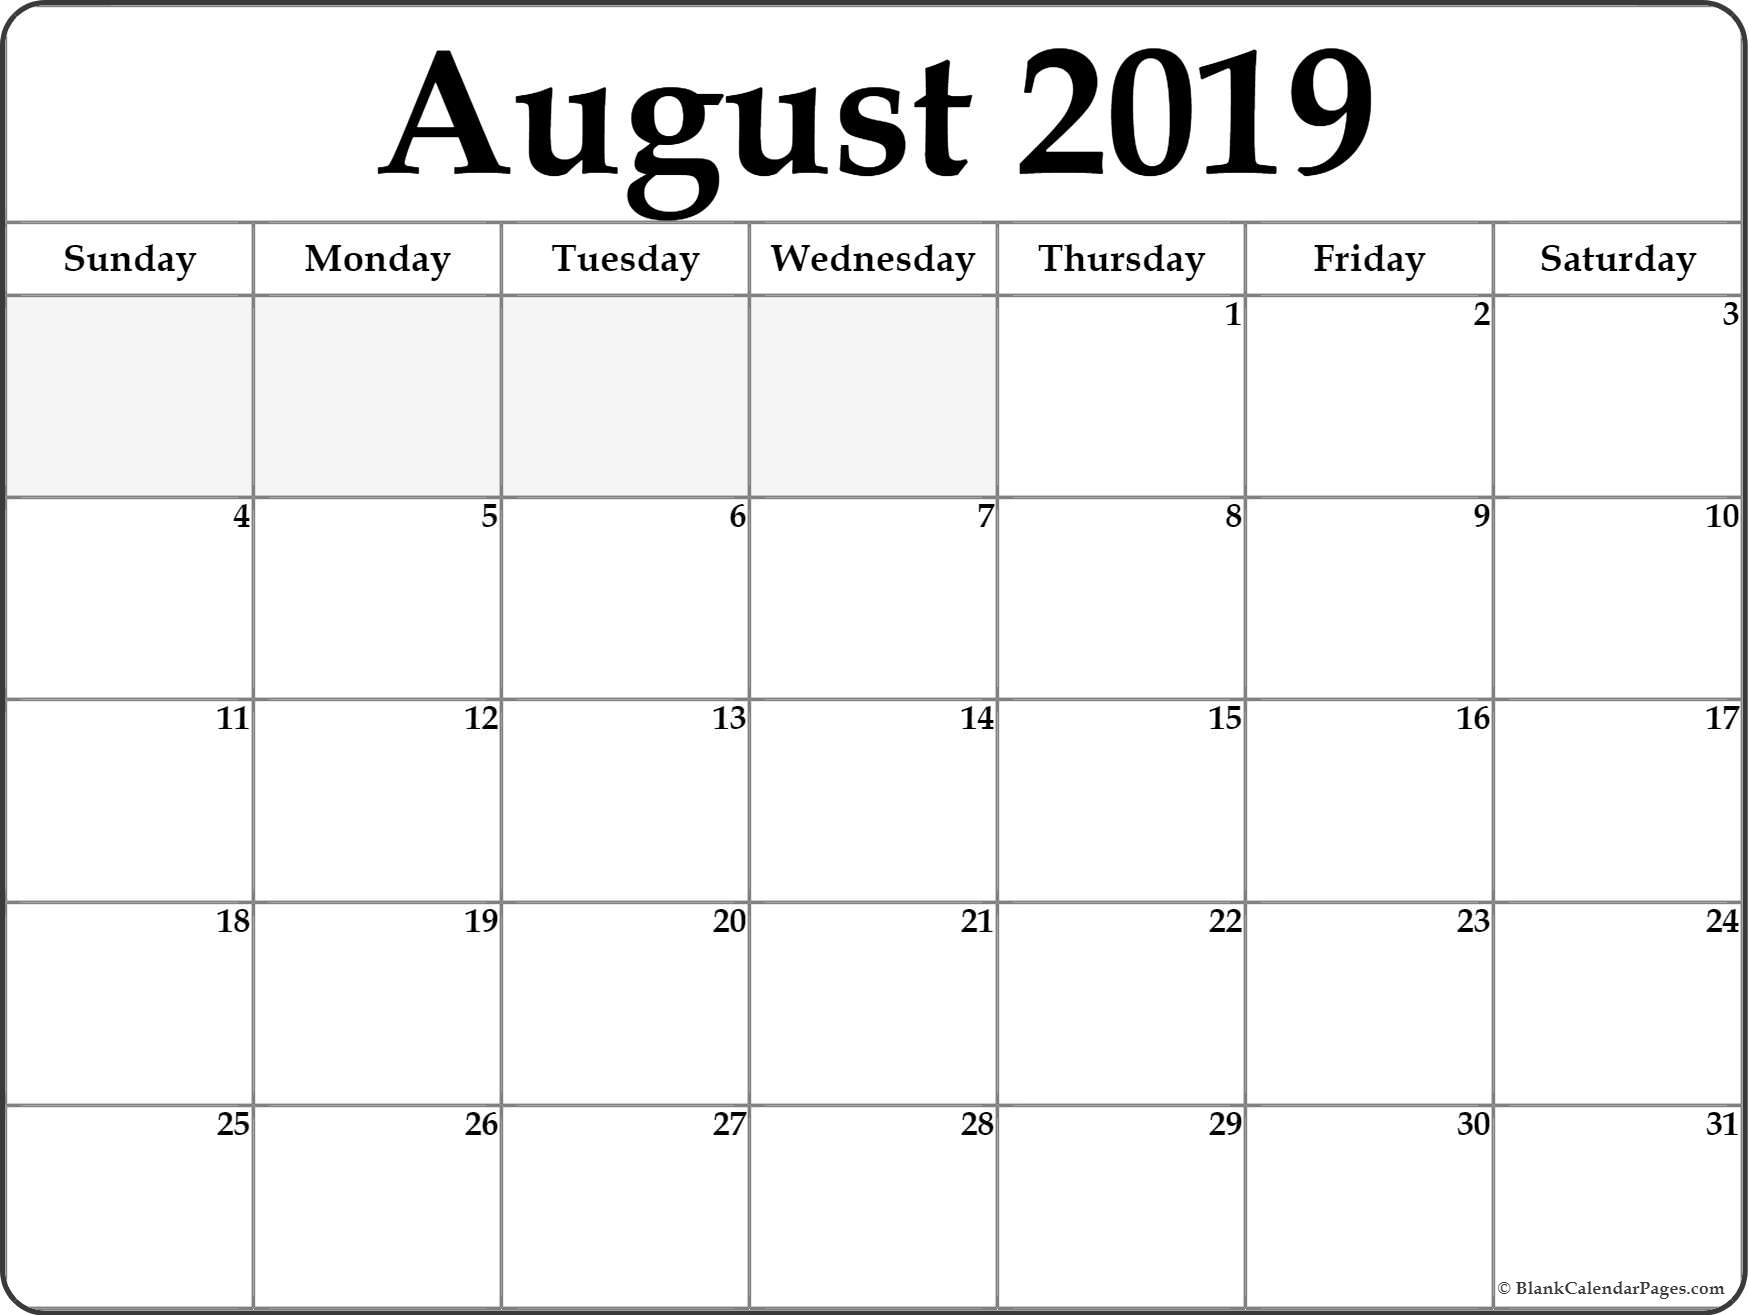 August 2019 Calendar | Free Printable Monthly Calendars regarding Blank August Colorful Calendar